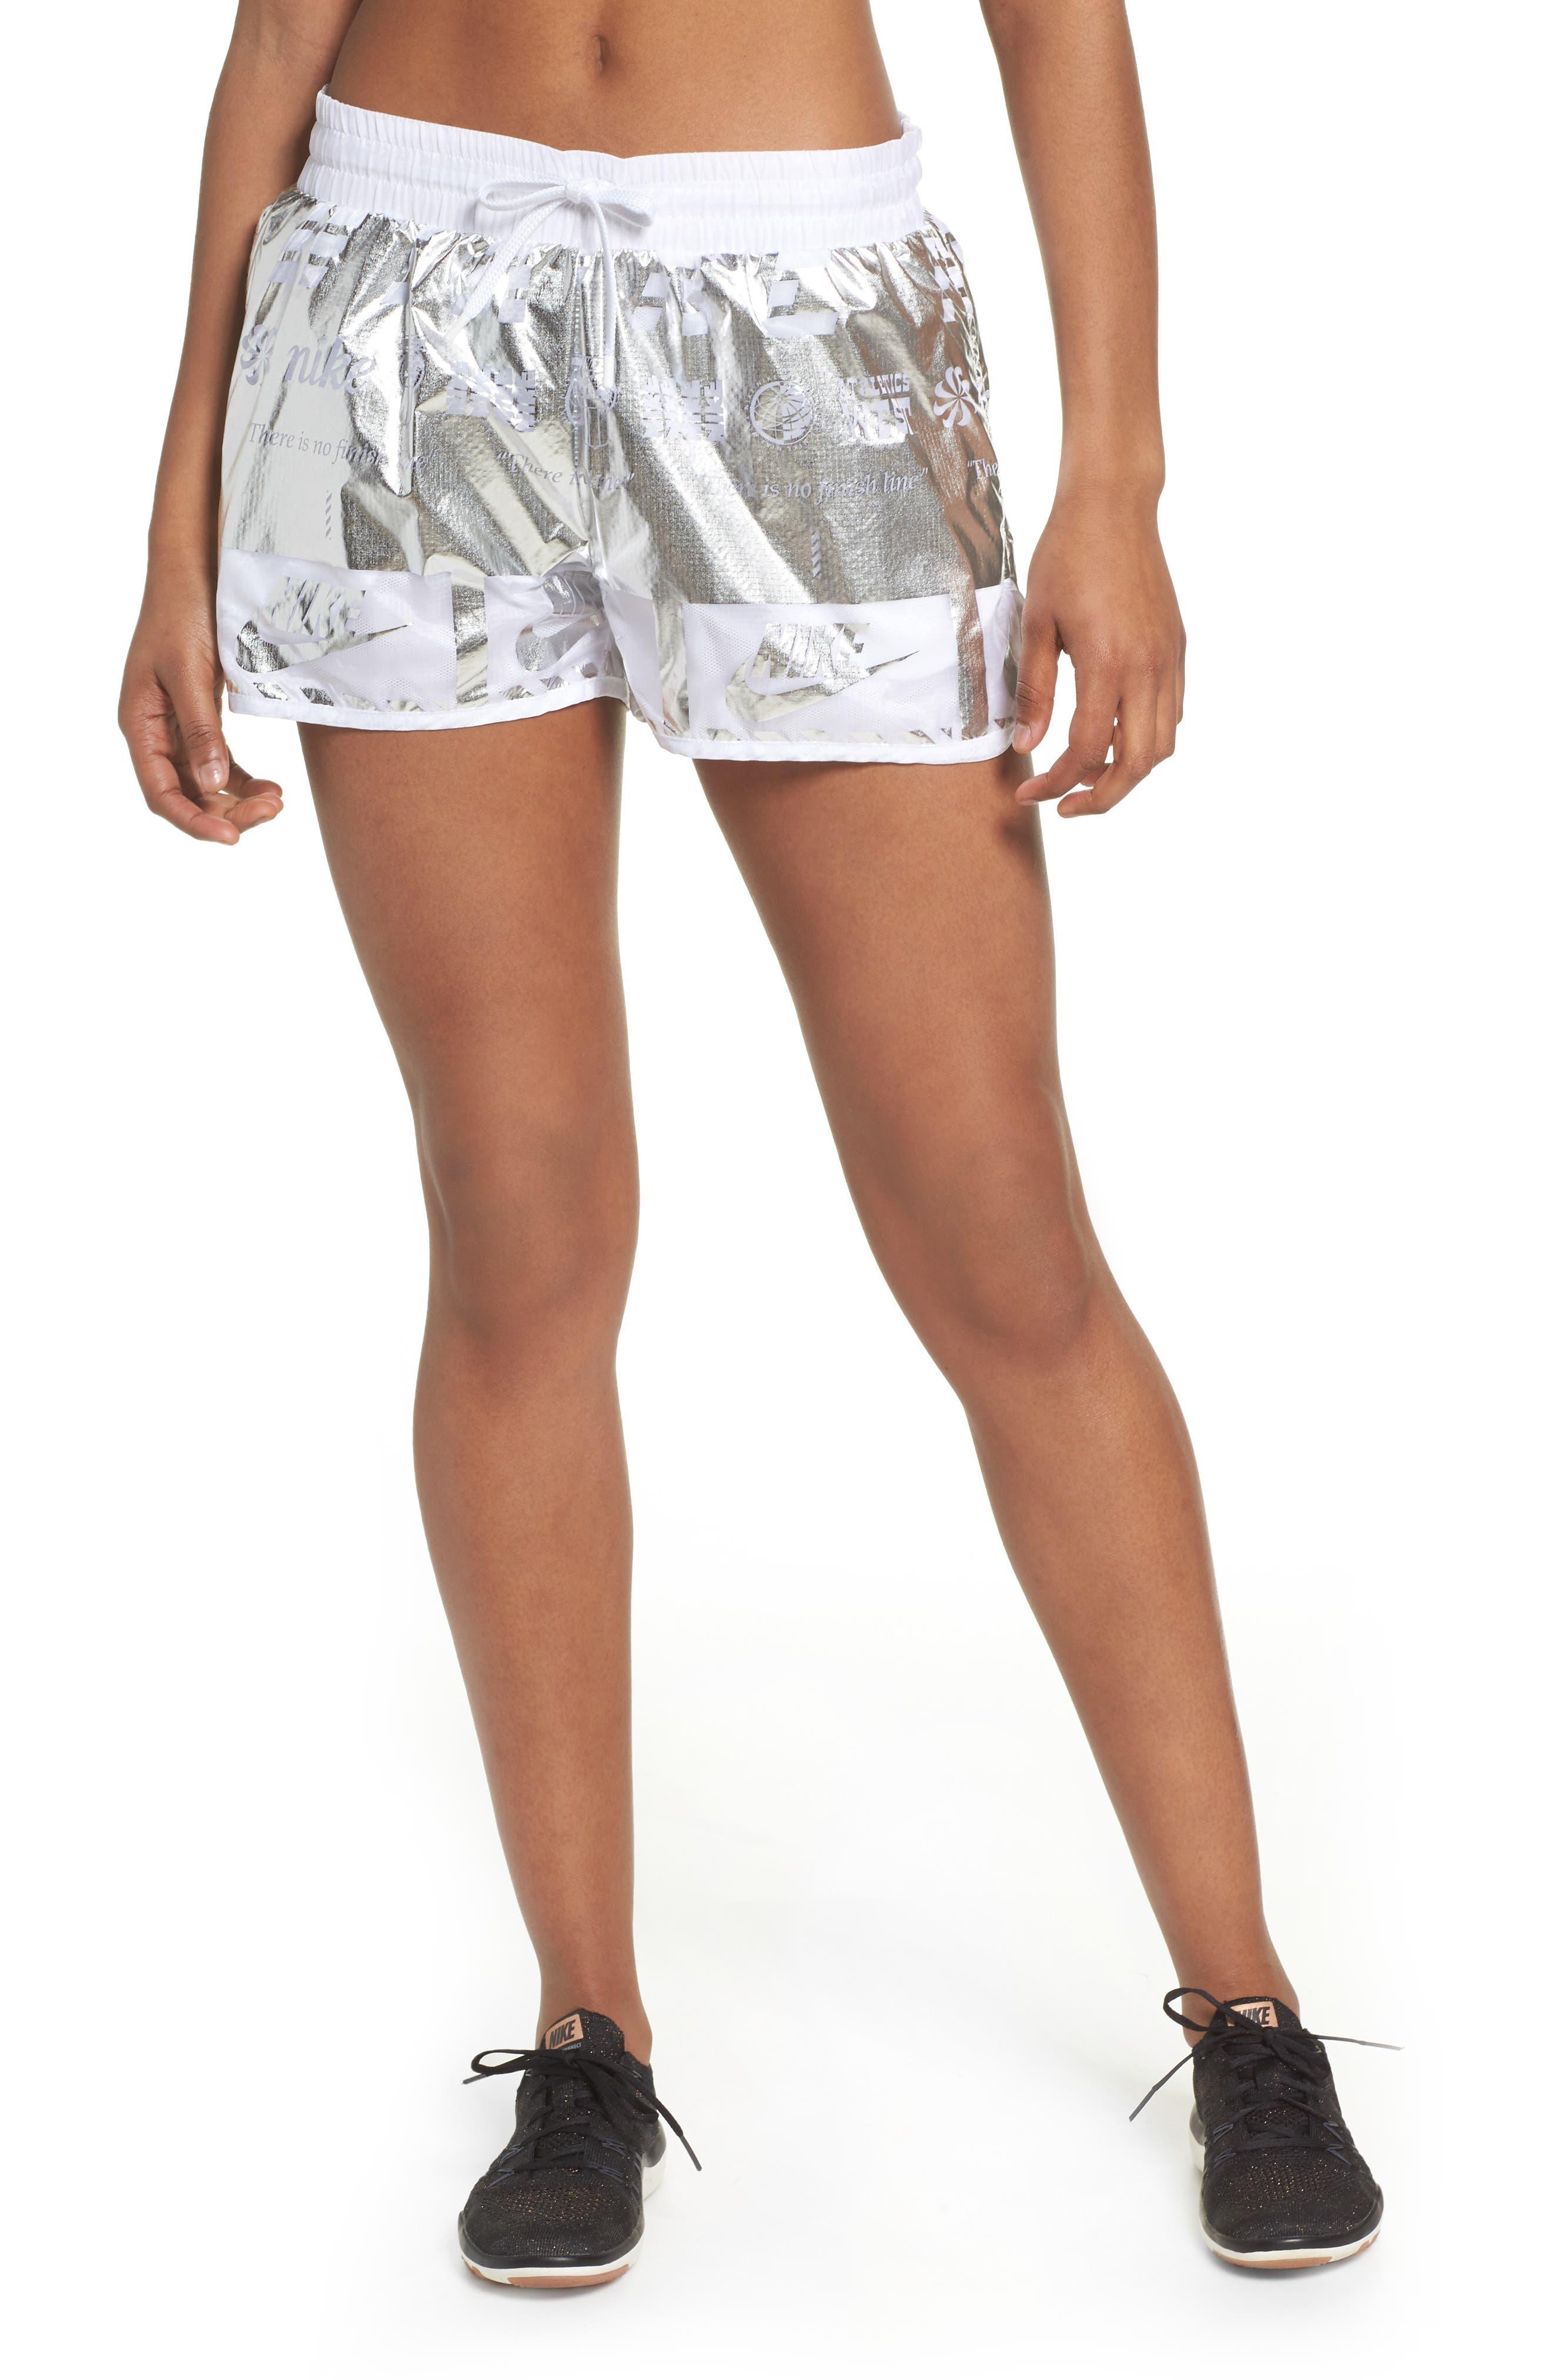 Sportswear Women's Metallic Shorts,                             Main thumbnail 1, color,                             White/ White